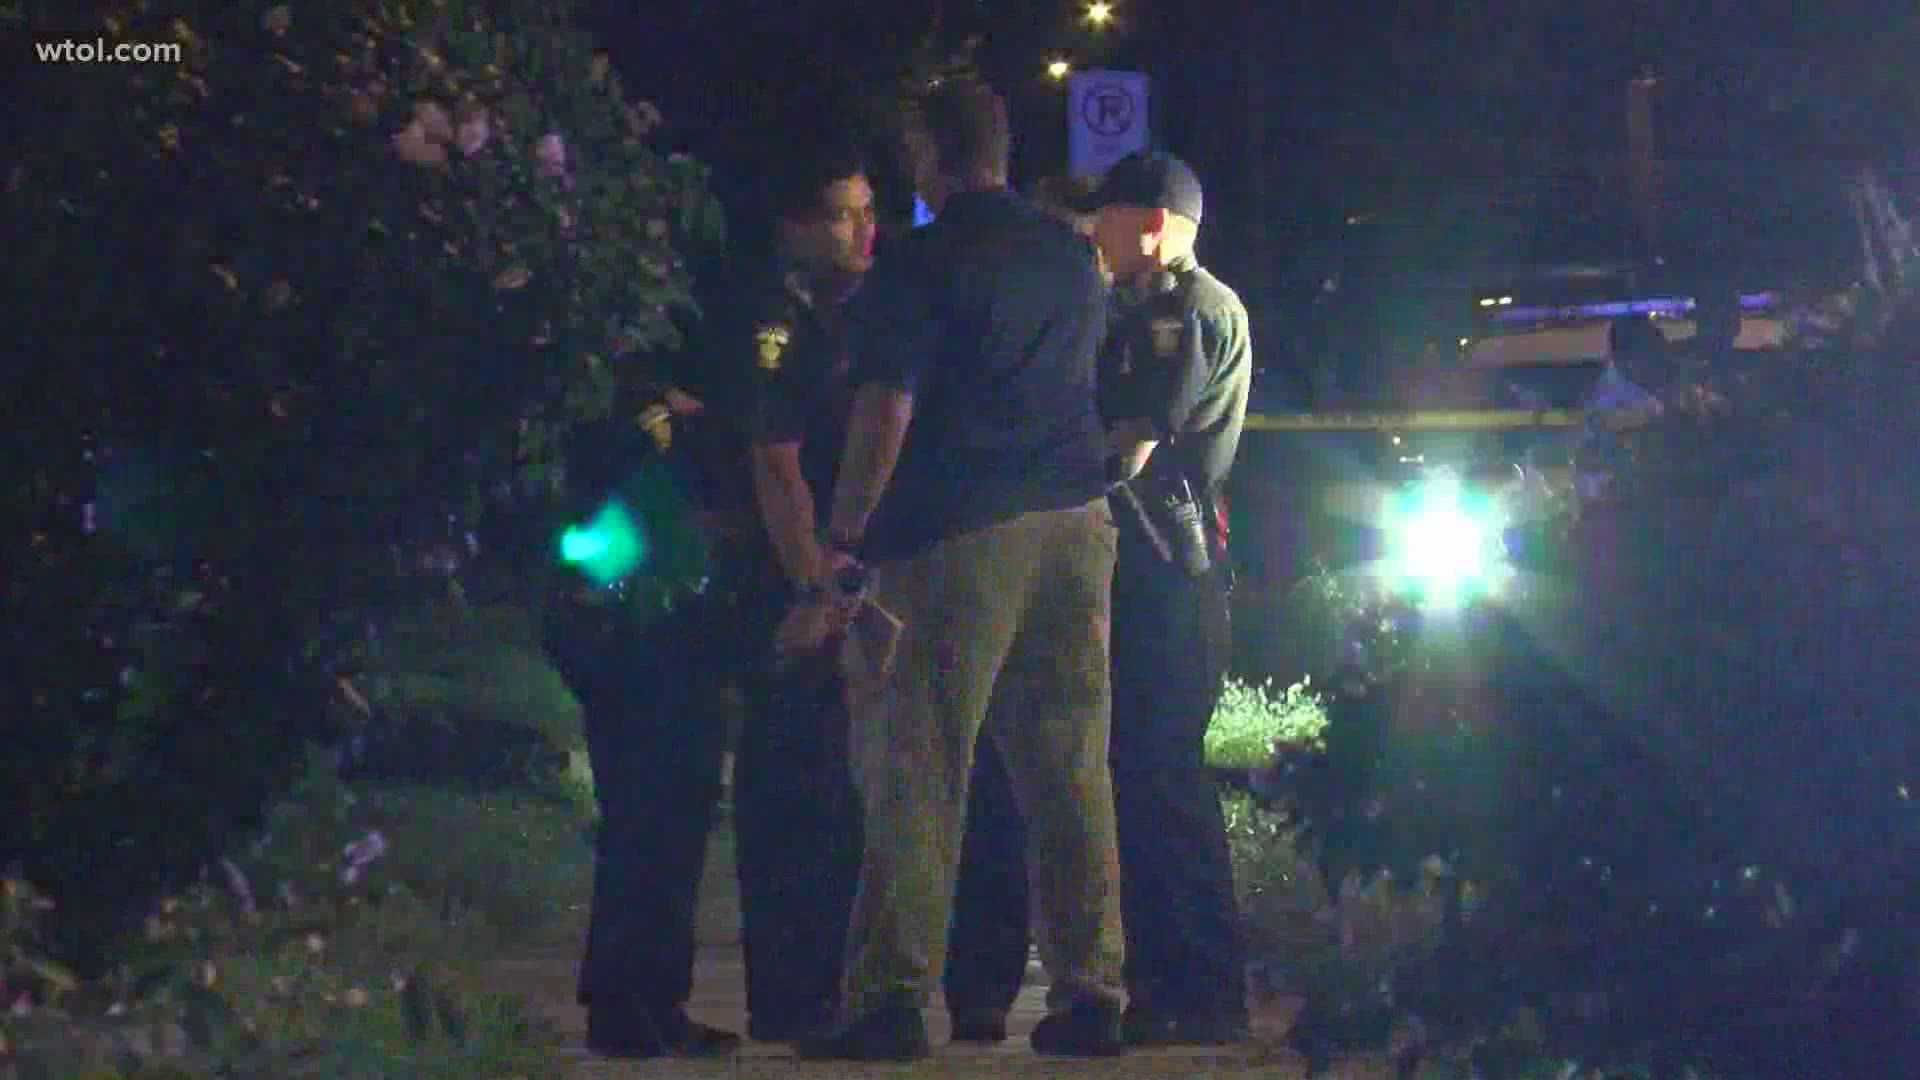 15 Year Old Shot Killed In Toledo Wtol Com